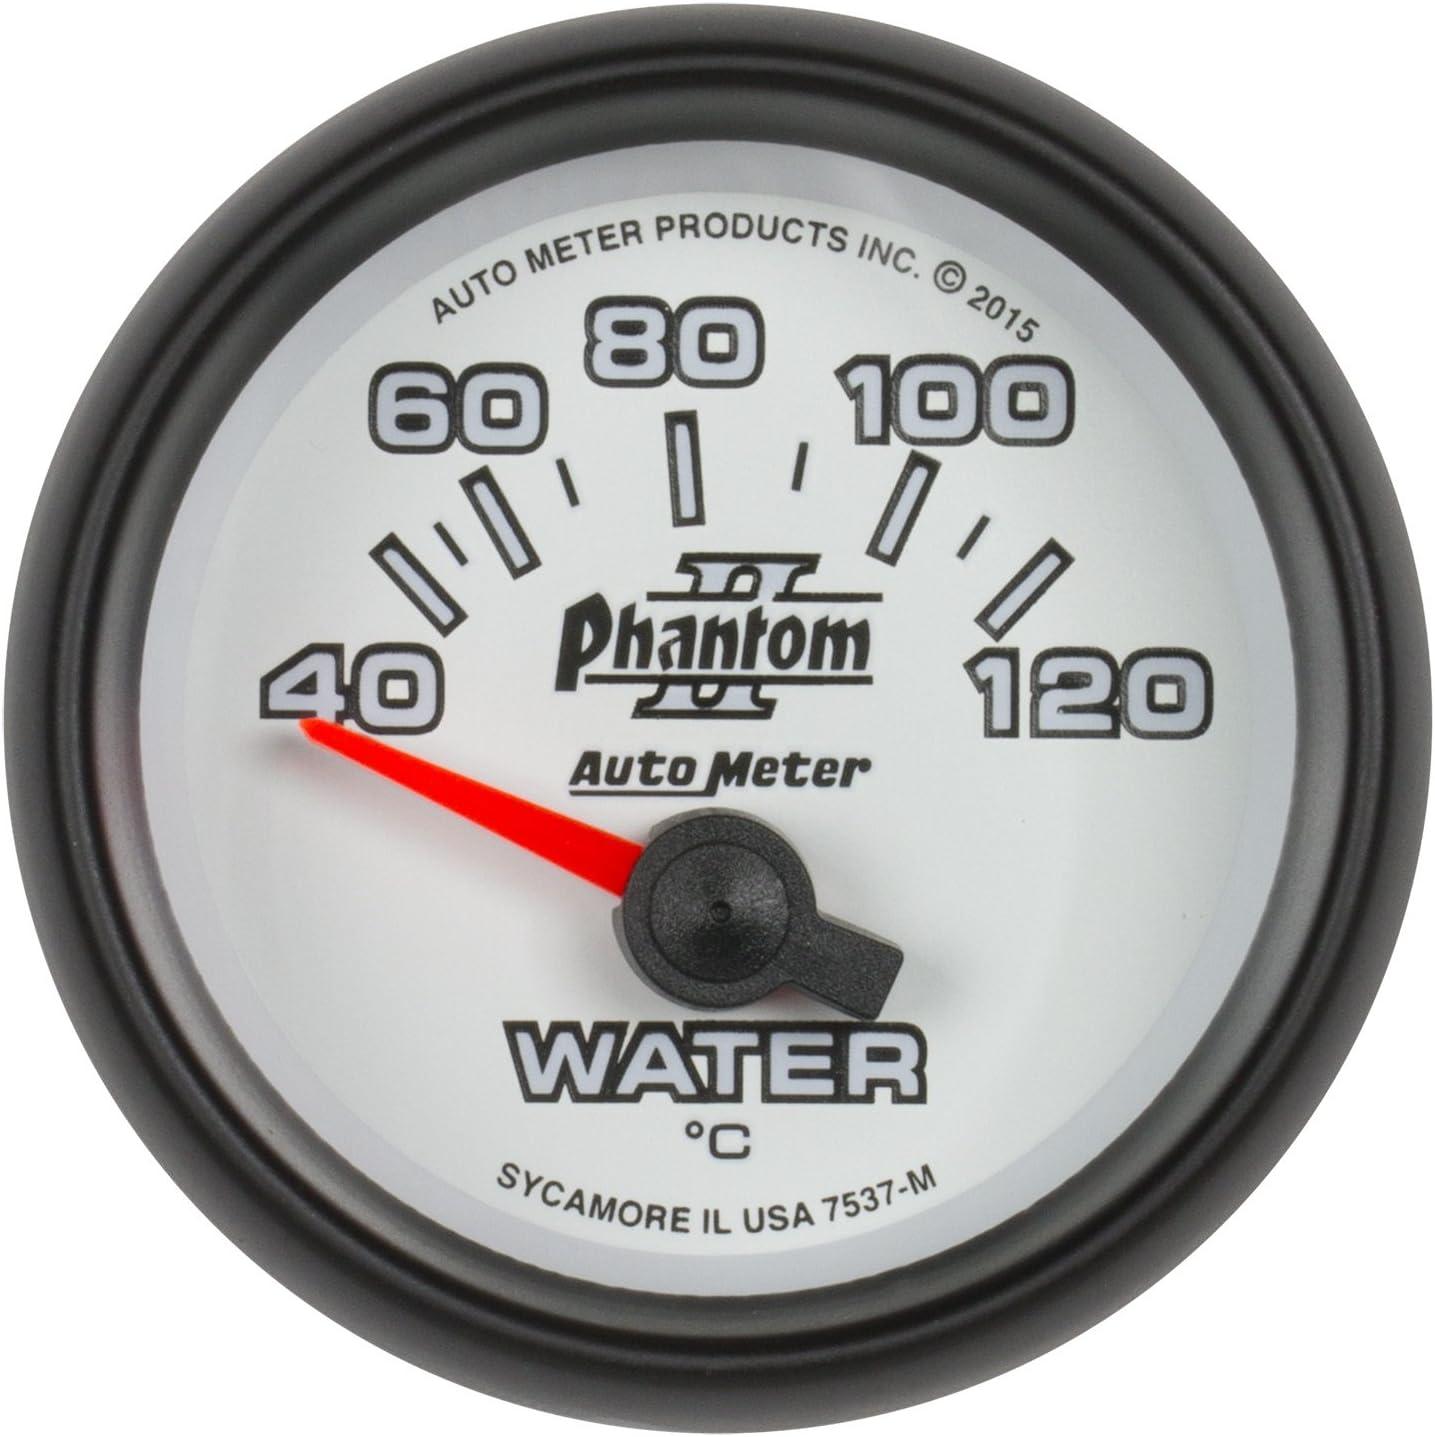 Water Temp 2 1//16 Ultra-Lite Ii 40-120/ºc Electric Auto Meter AutoMeter 4937-M Gauge